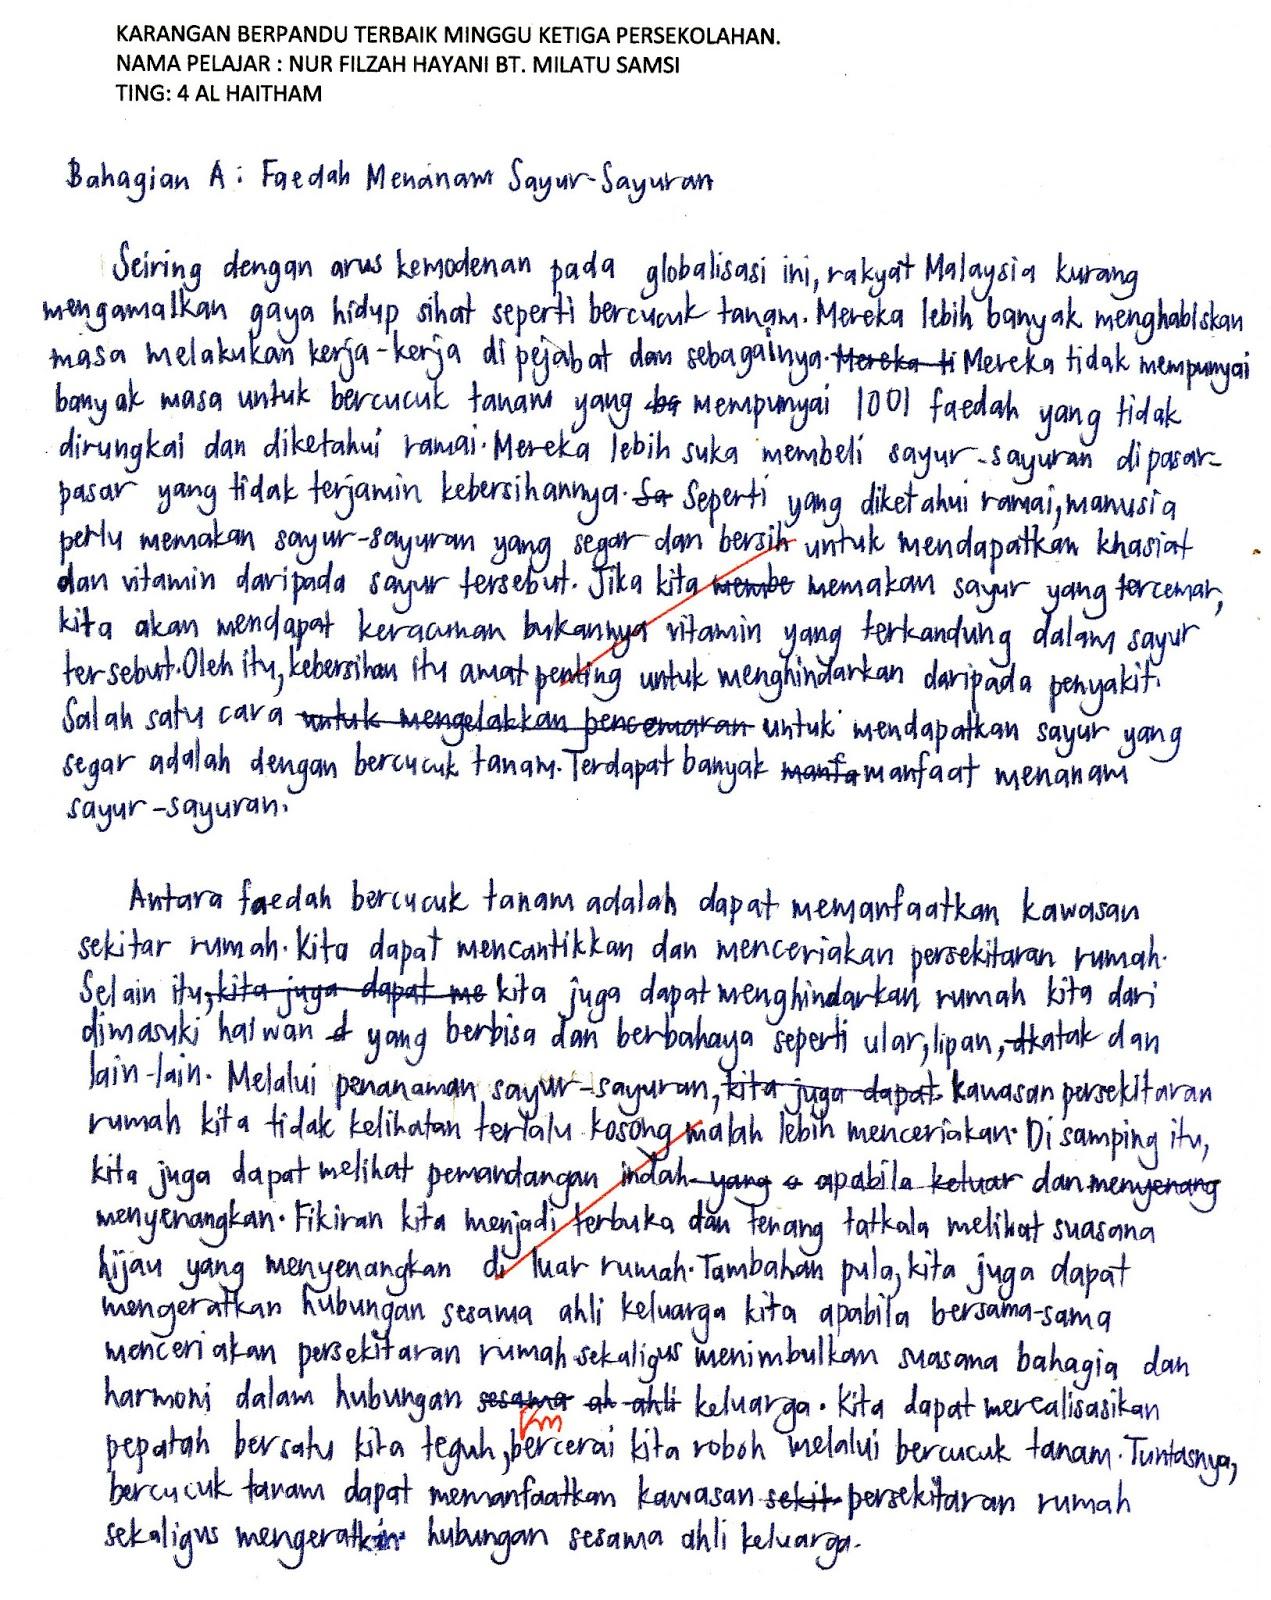 Plagiarism fre written essay